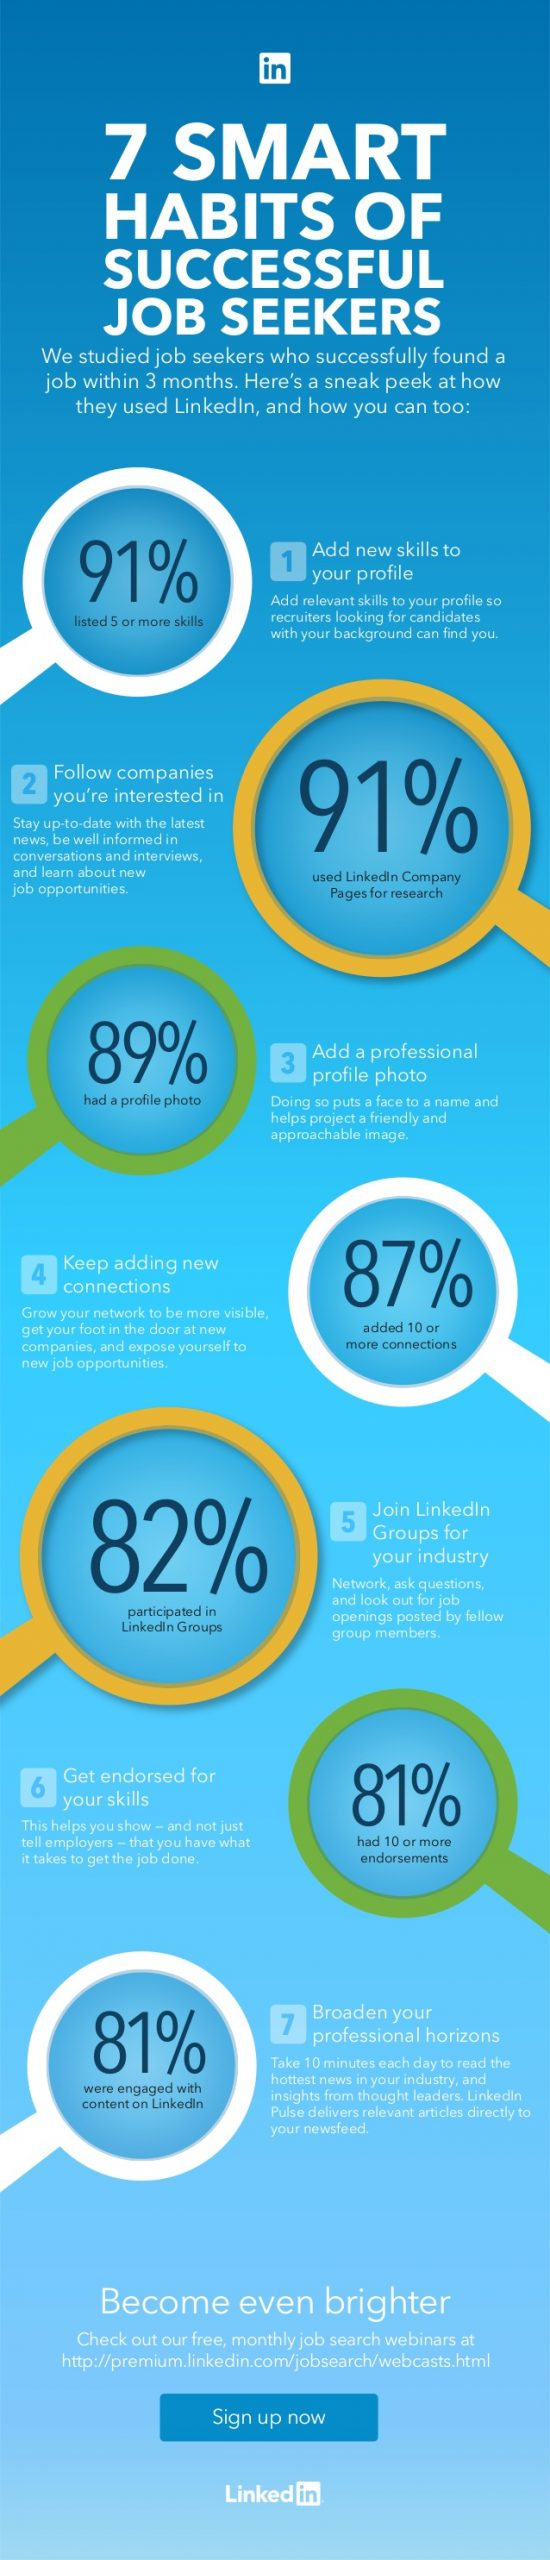 7-smart-habits-of-successful-job-seekers-1-638